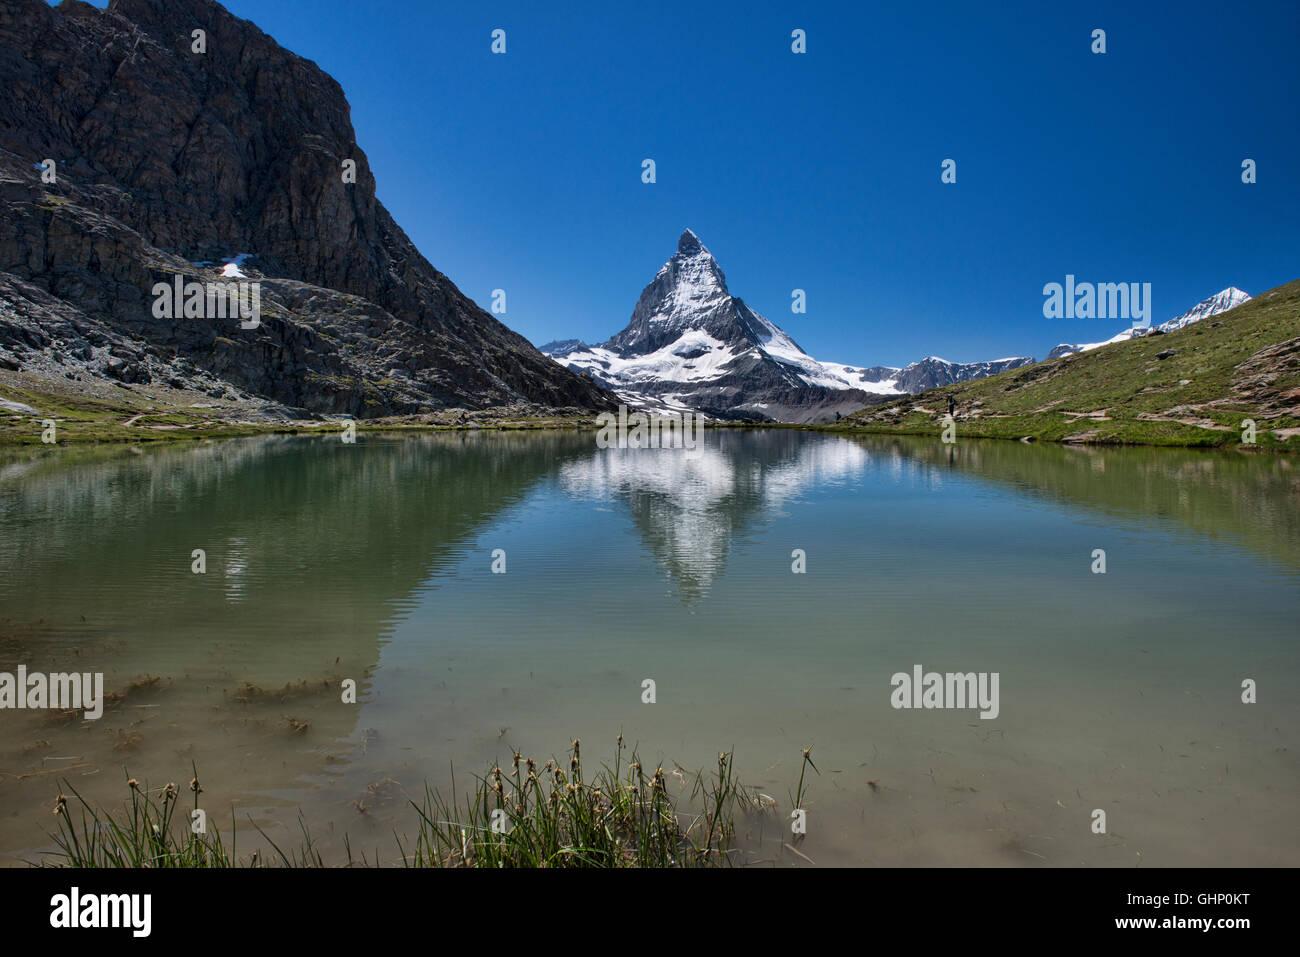 The Matterhorn reflected in the Riffelsee Lake, Zermatt, Switzerland - Stock Image